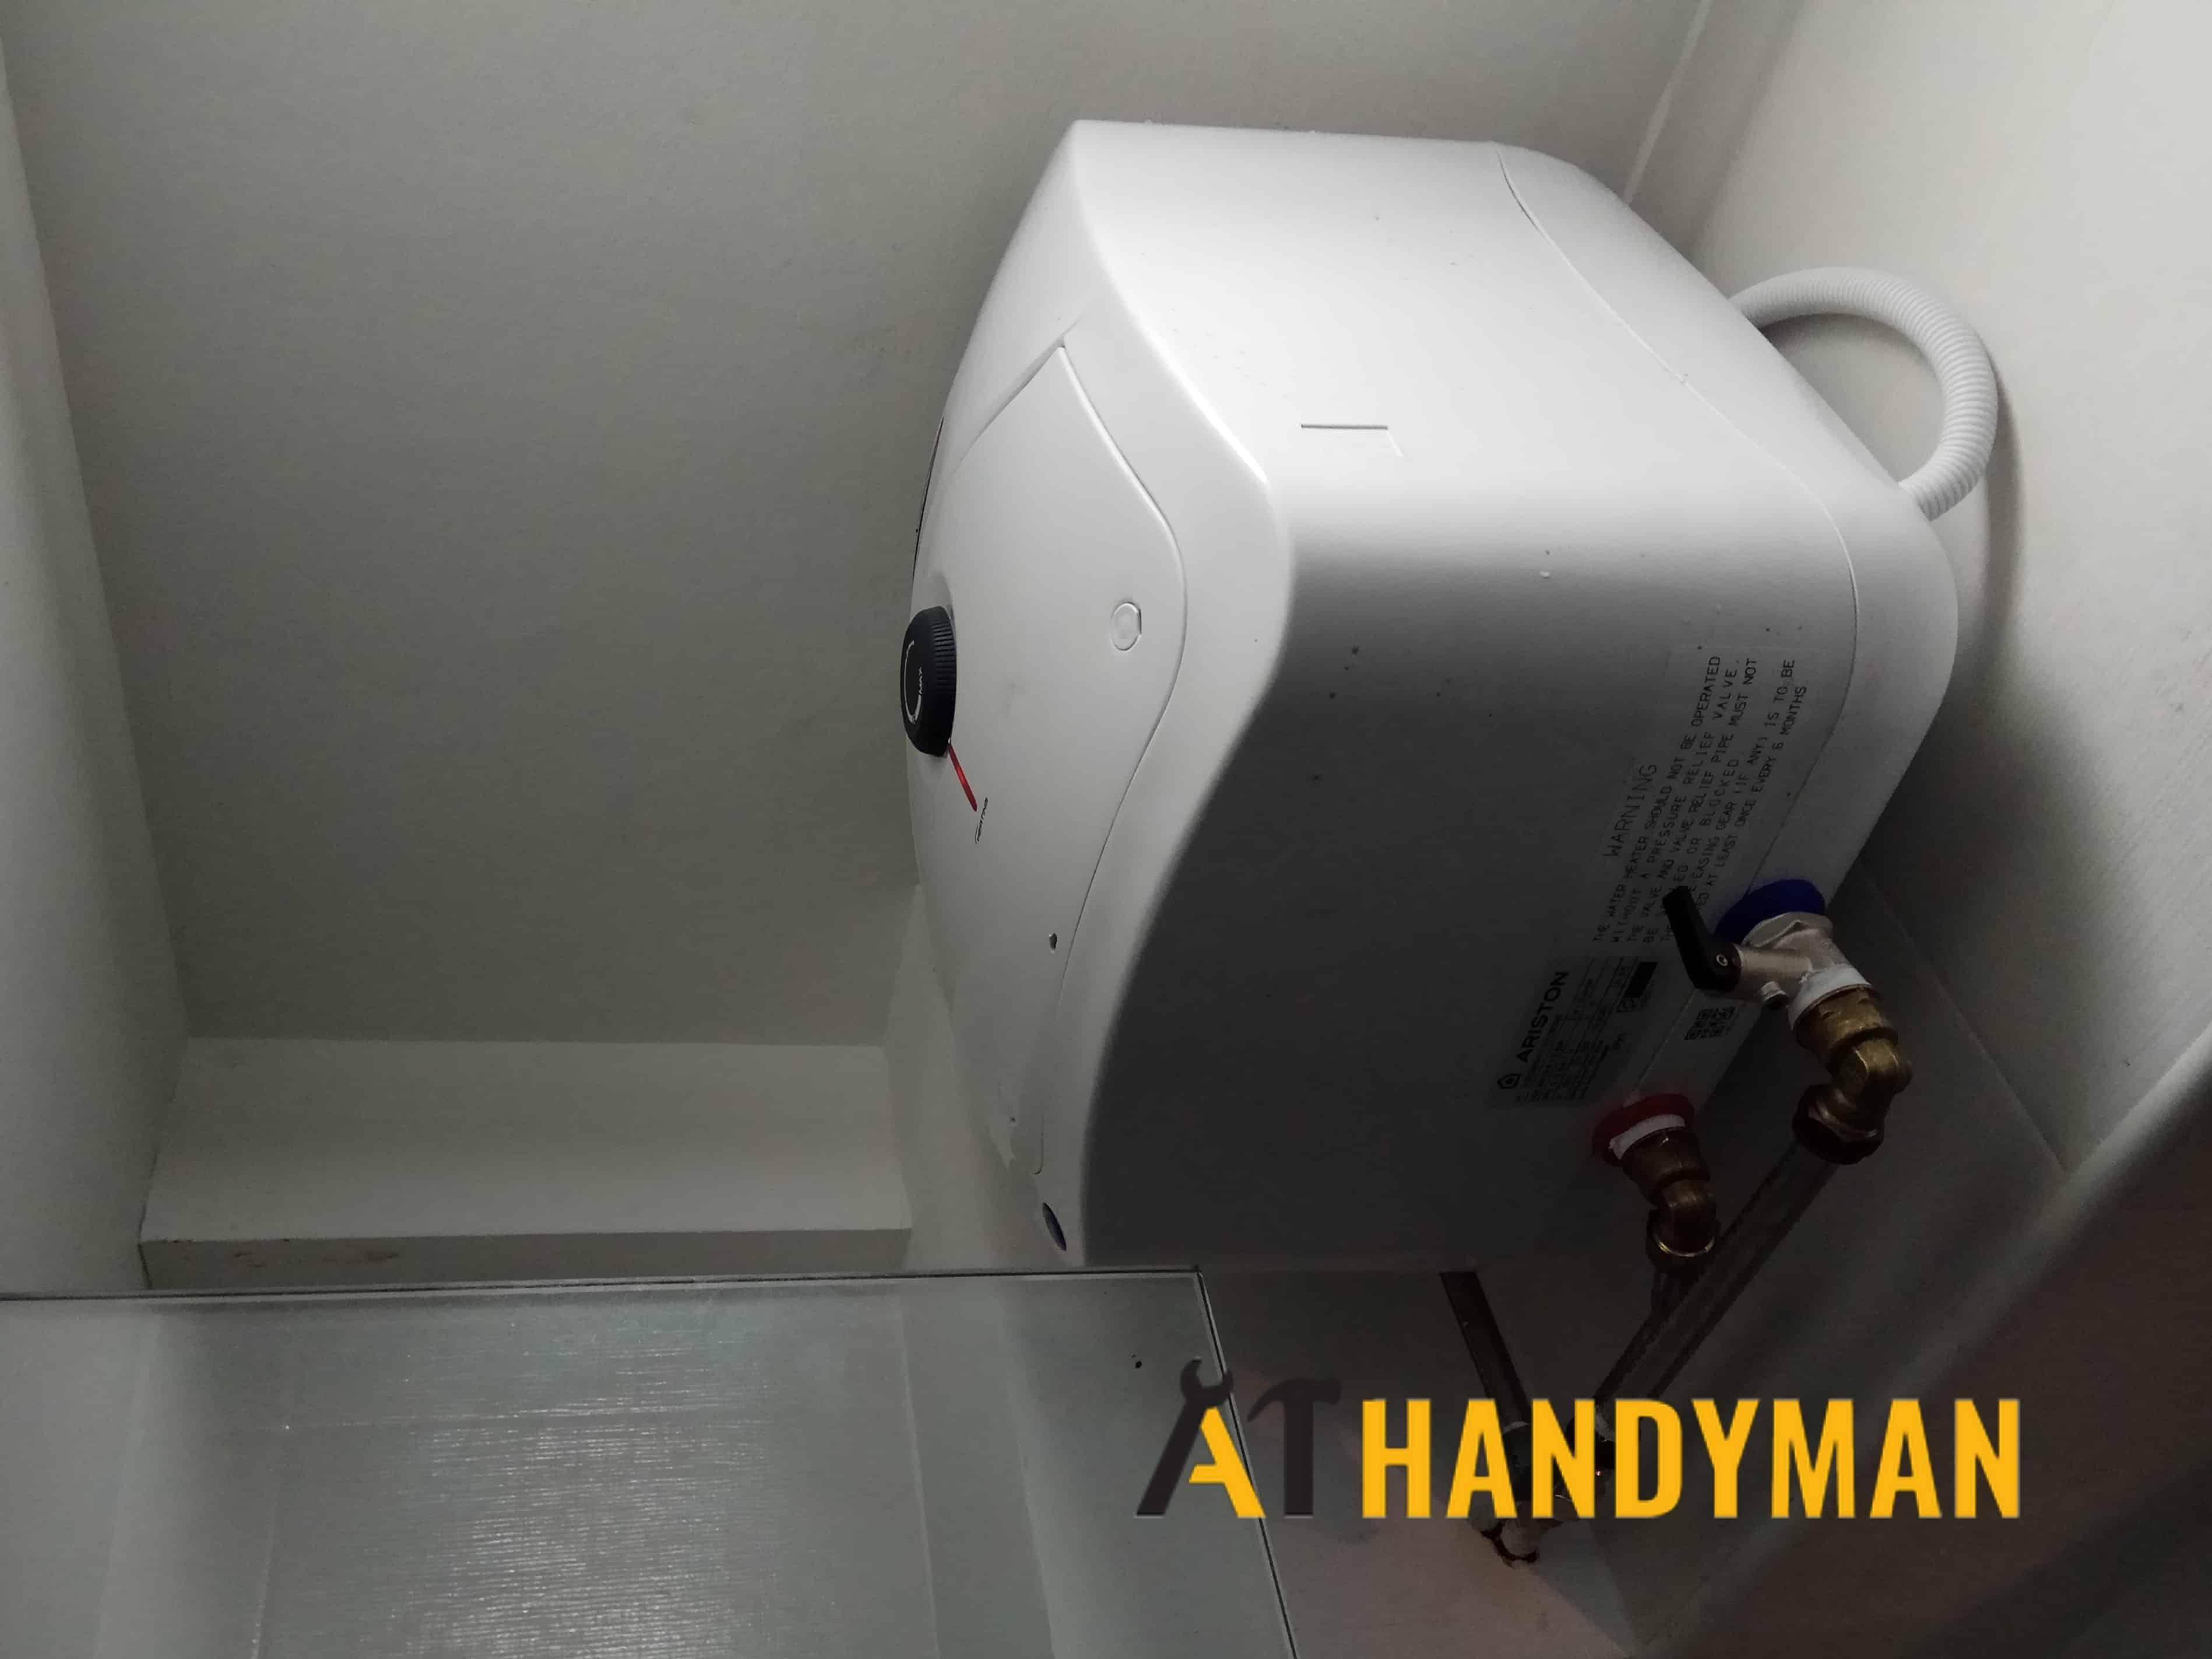 Ariston-storage-water-heater-tank-installation-plumber-singapore-a1-handyman-singapore-hdb-boon-lay-2_wm